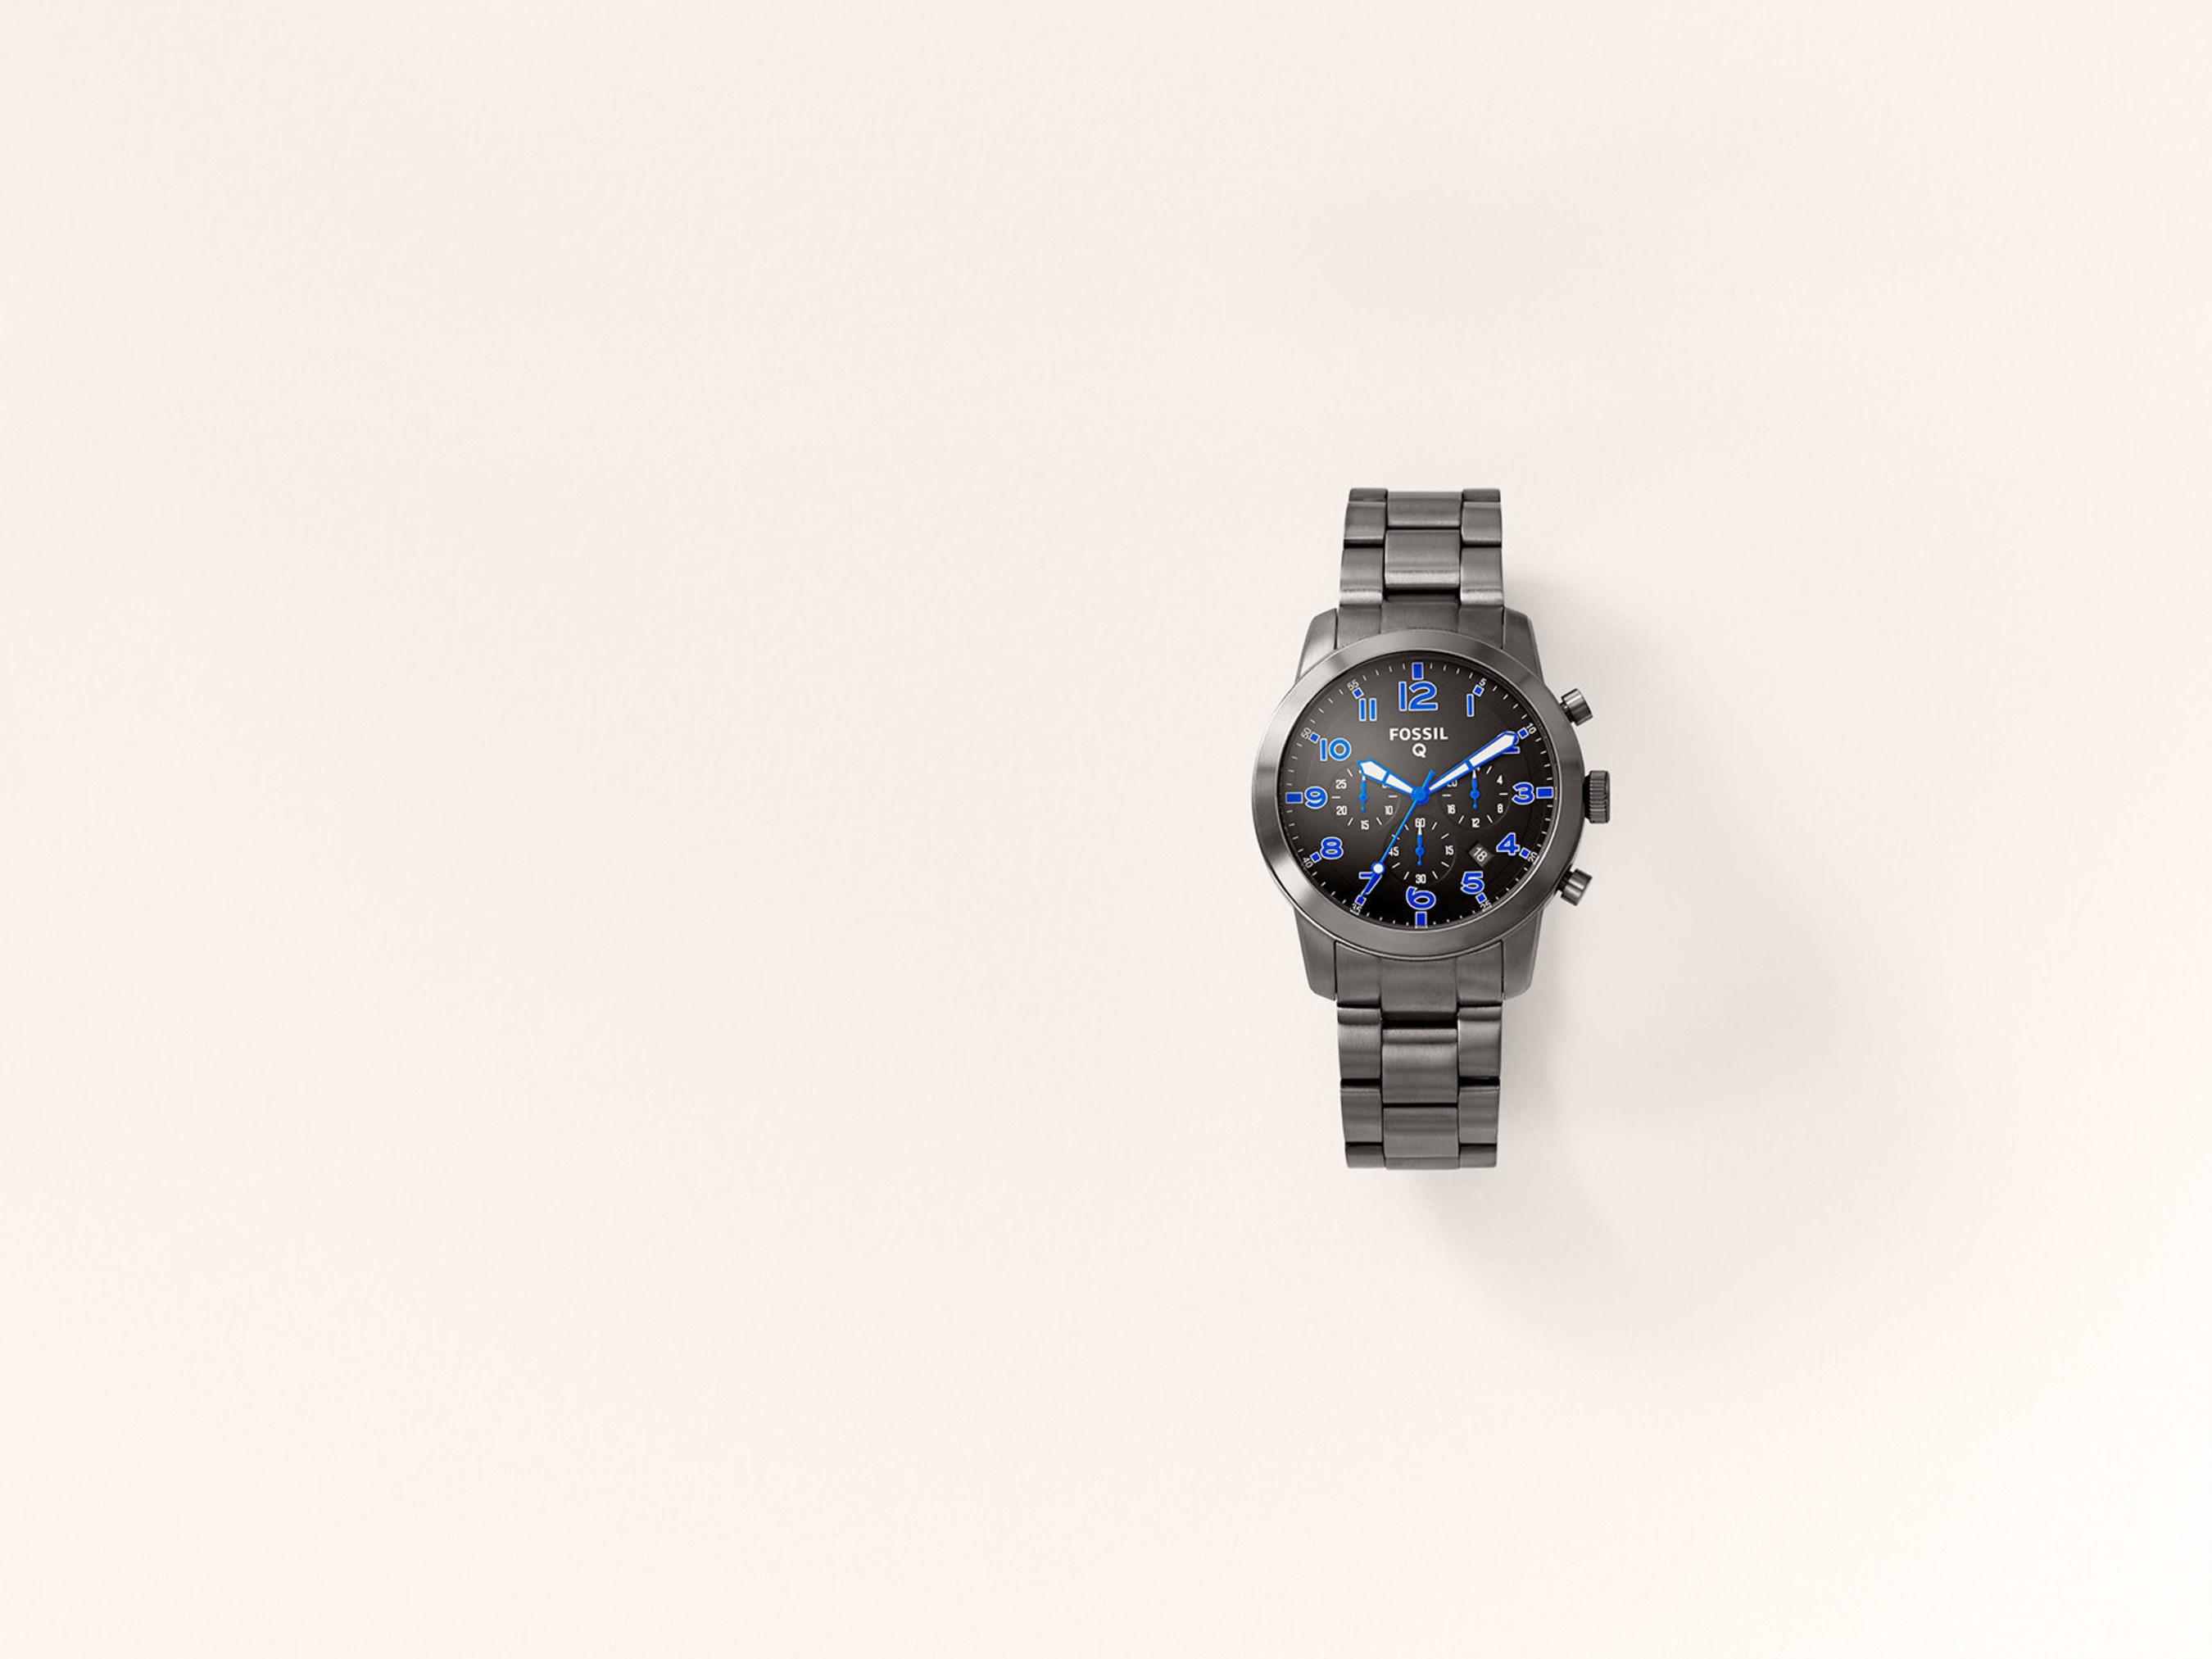 Fossil's Q54 Pilot smartwatch.